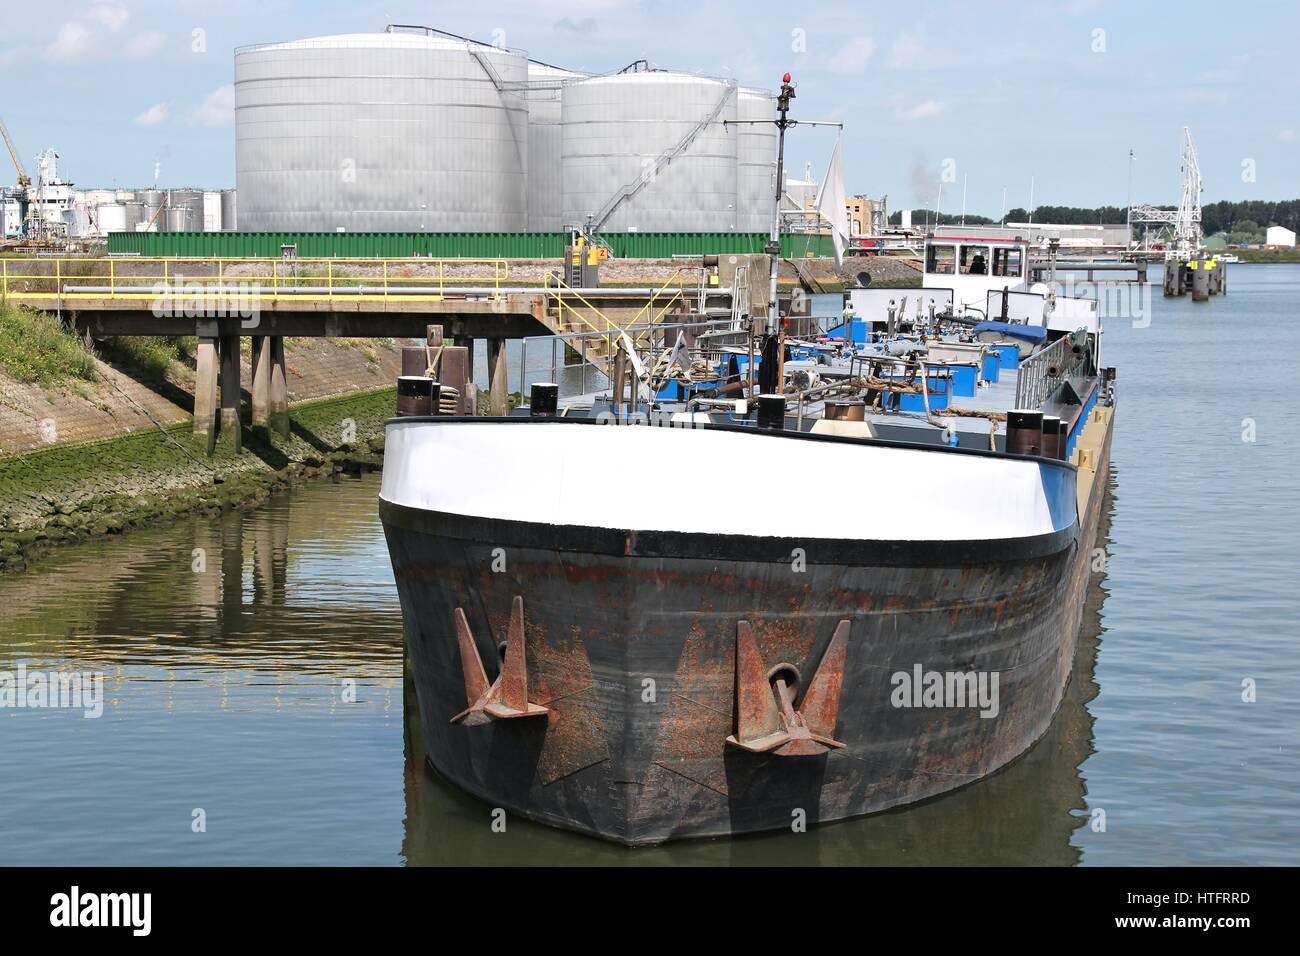 inland tanker vessel in harbor - Stock Image